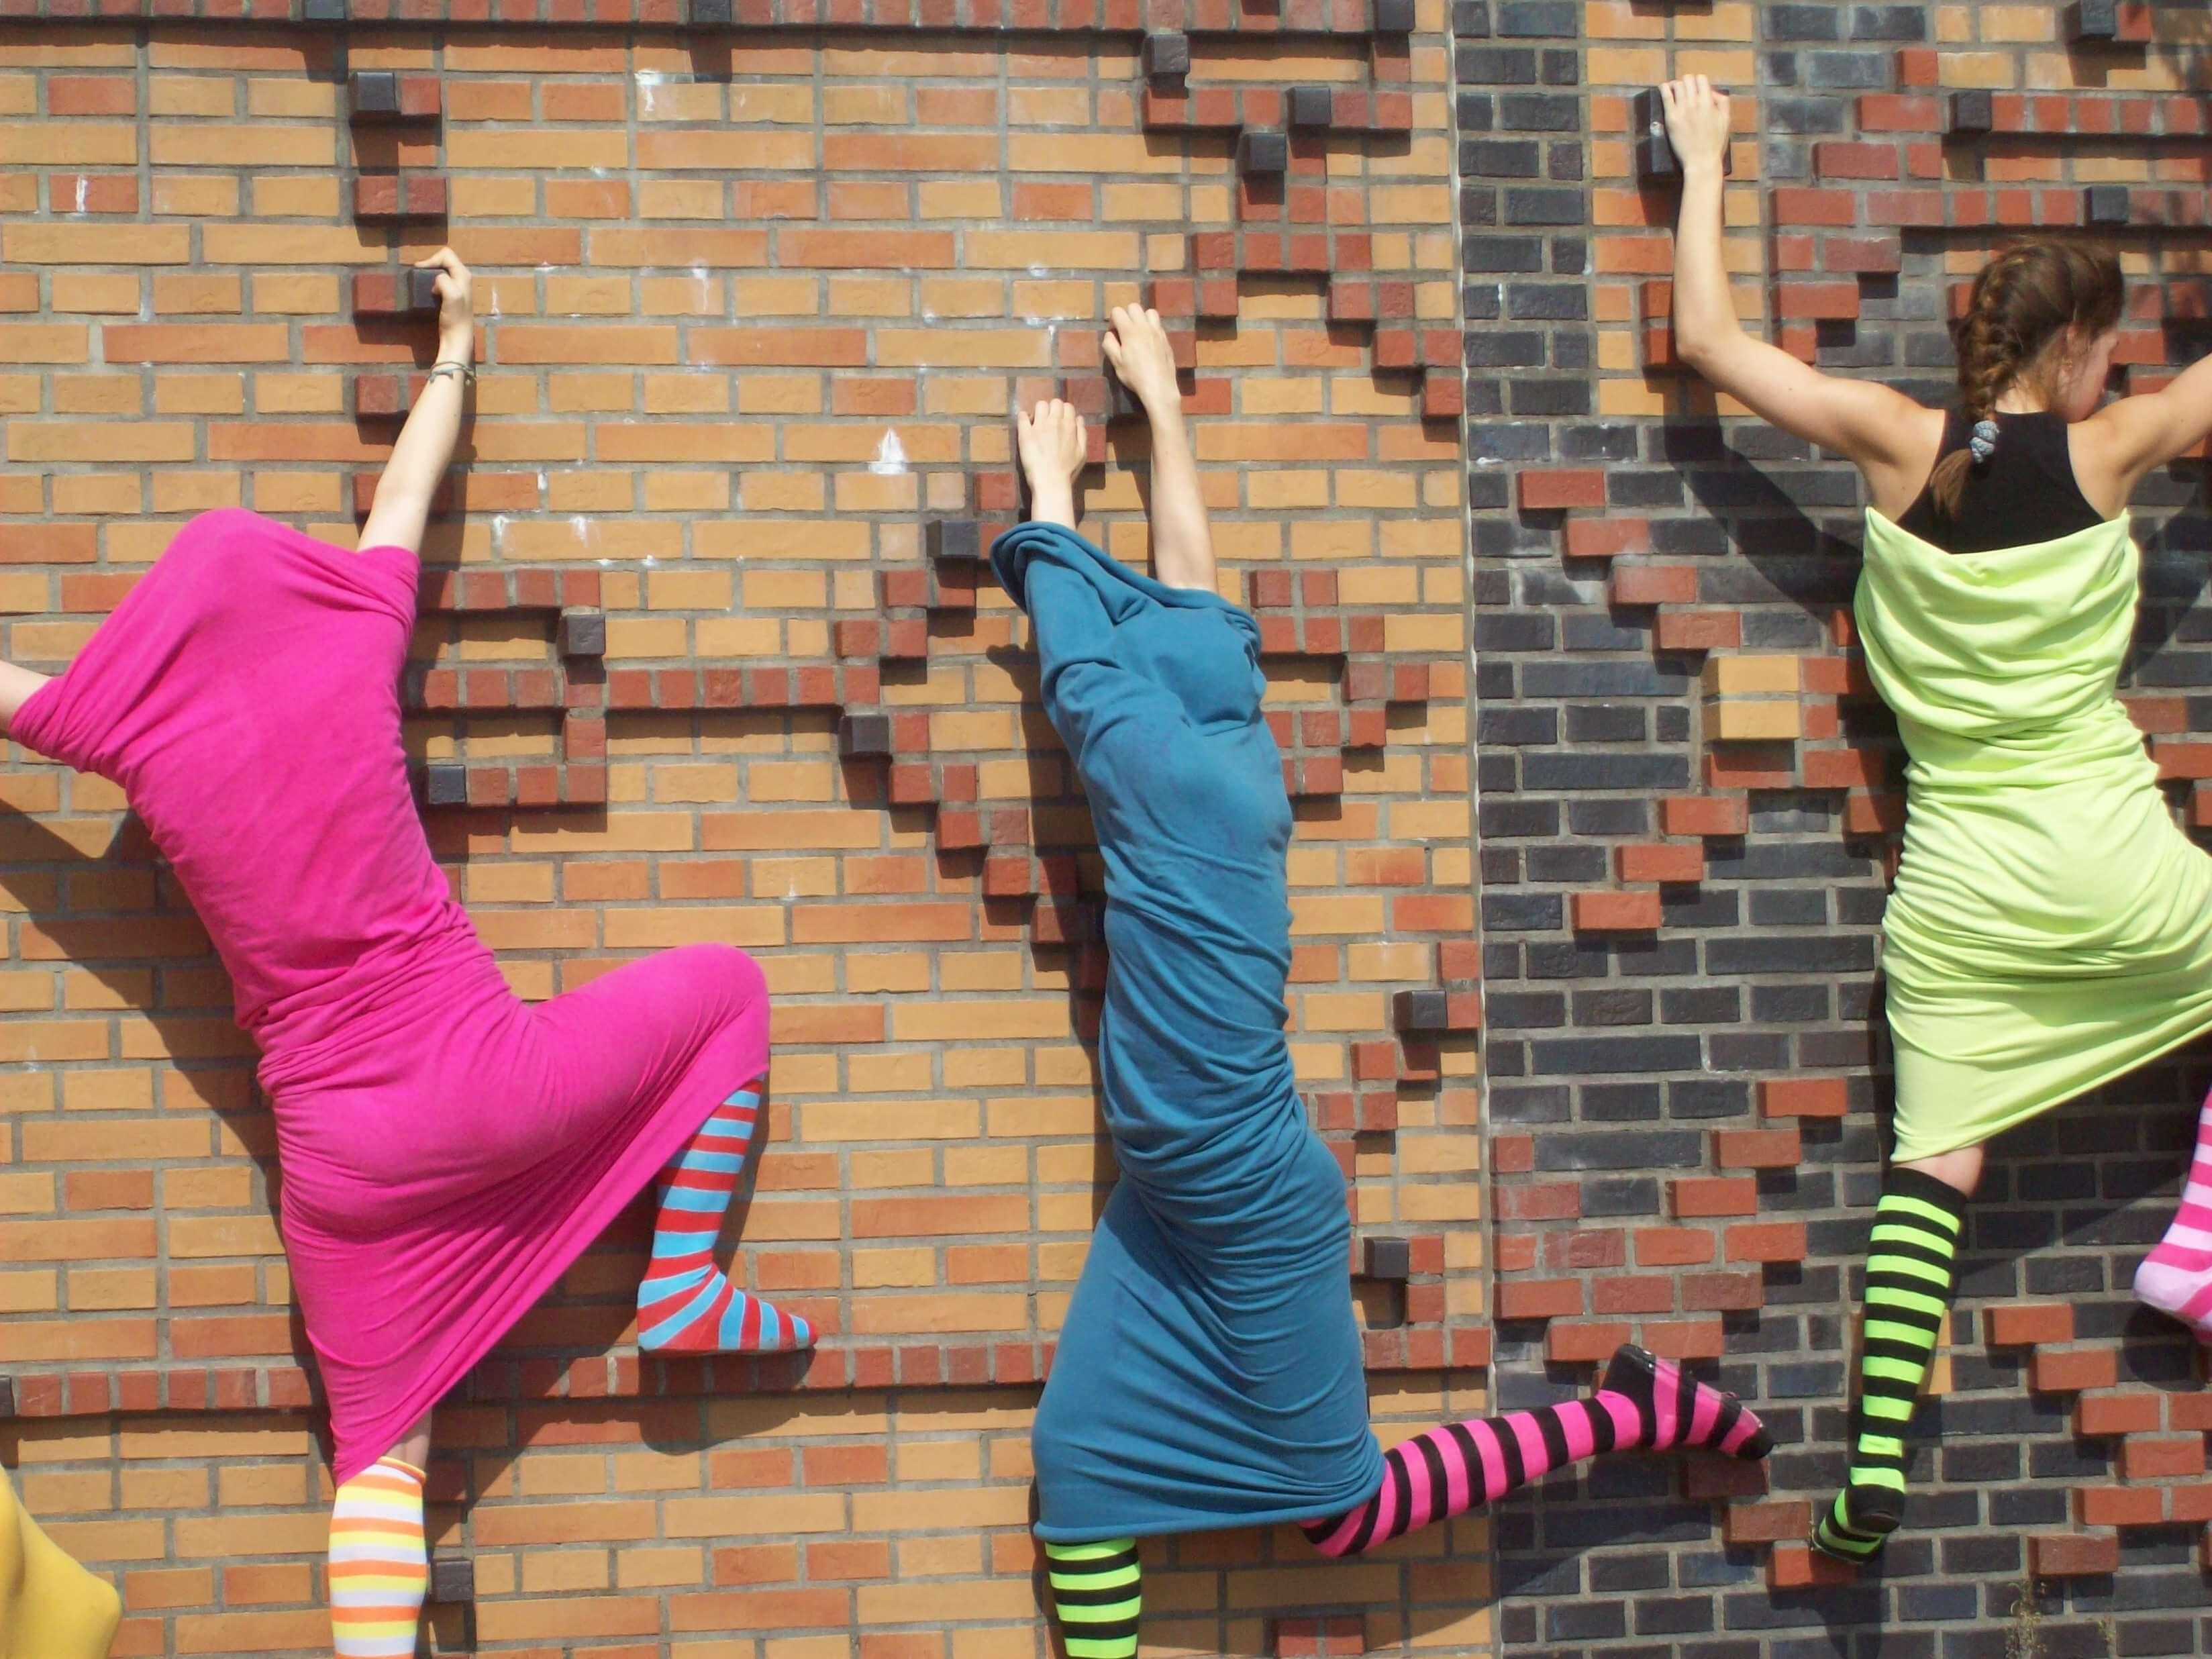 100_1504-lola-rogge-schule-performance-elphi-august-2019-monika-weller